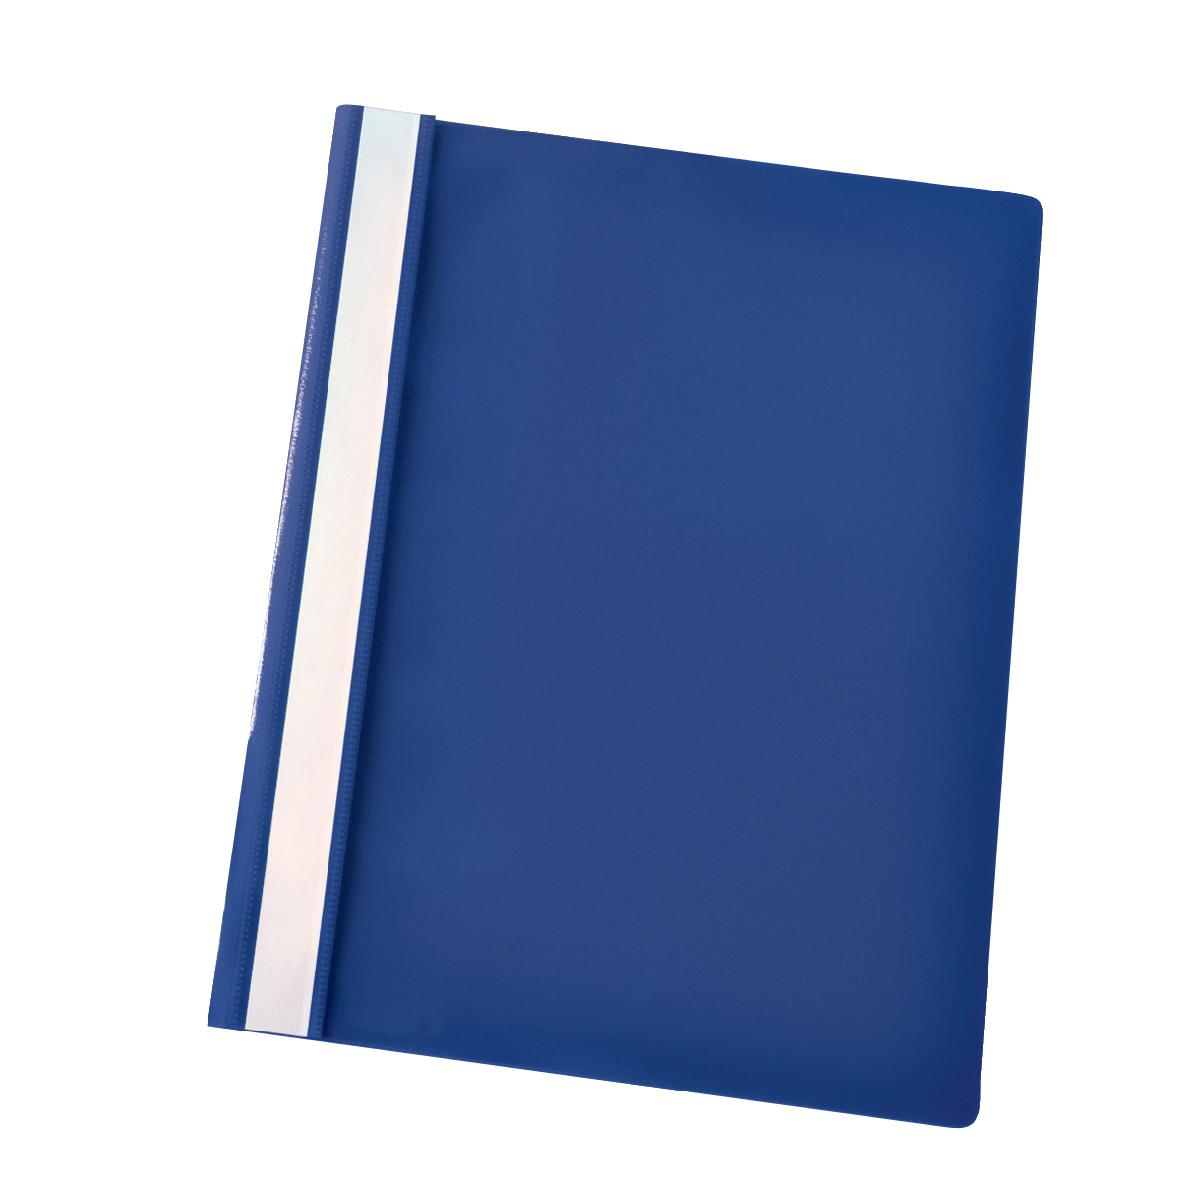 Esselte Report Flat File Lightweight Plastic Clear Front A4 Dark Blue Ref 28315 [Pack 25]